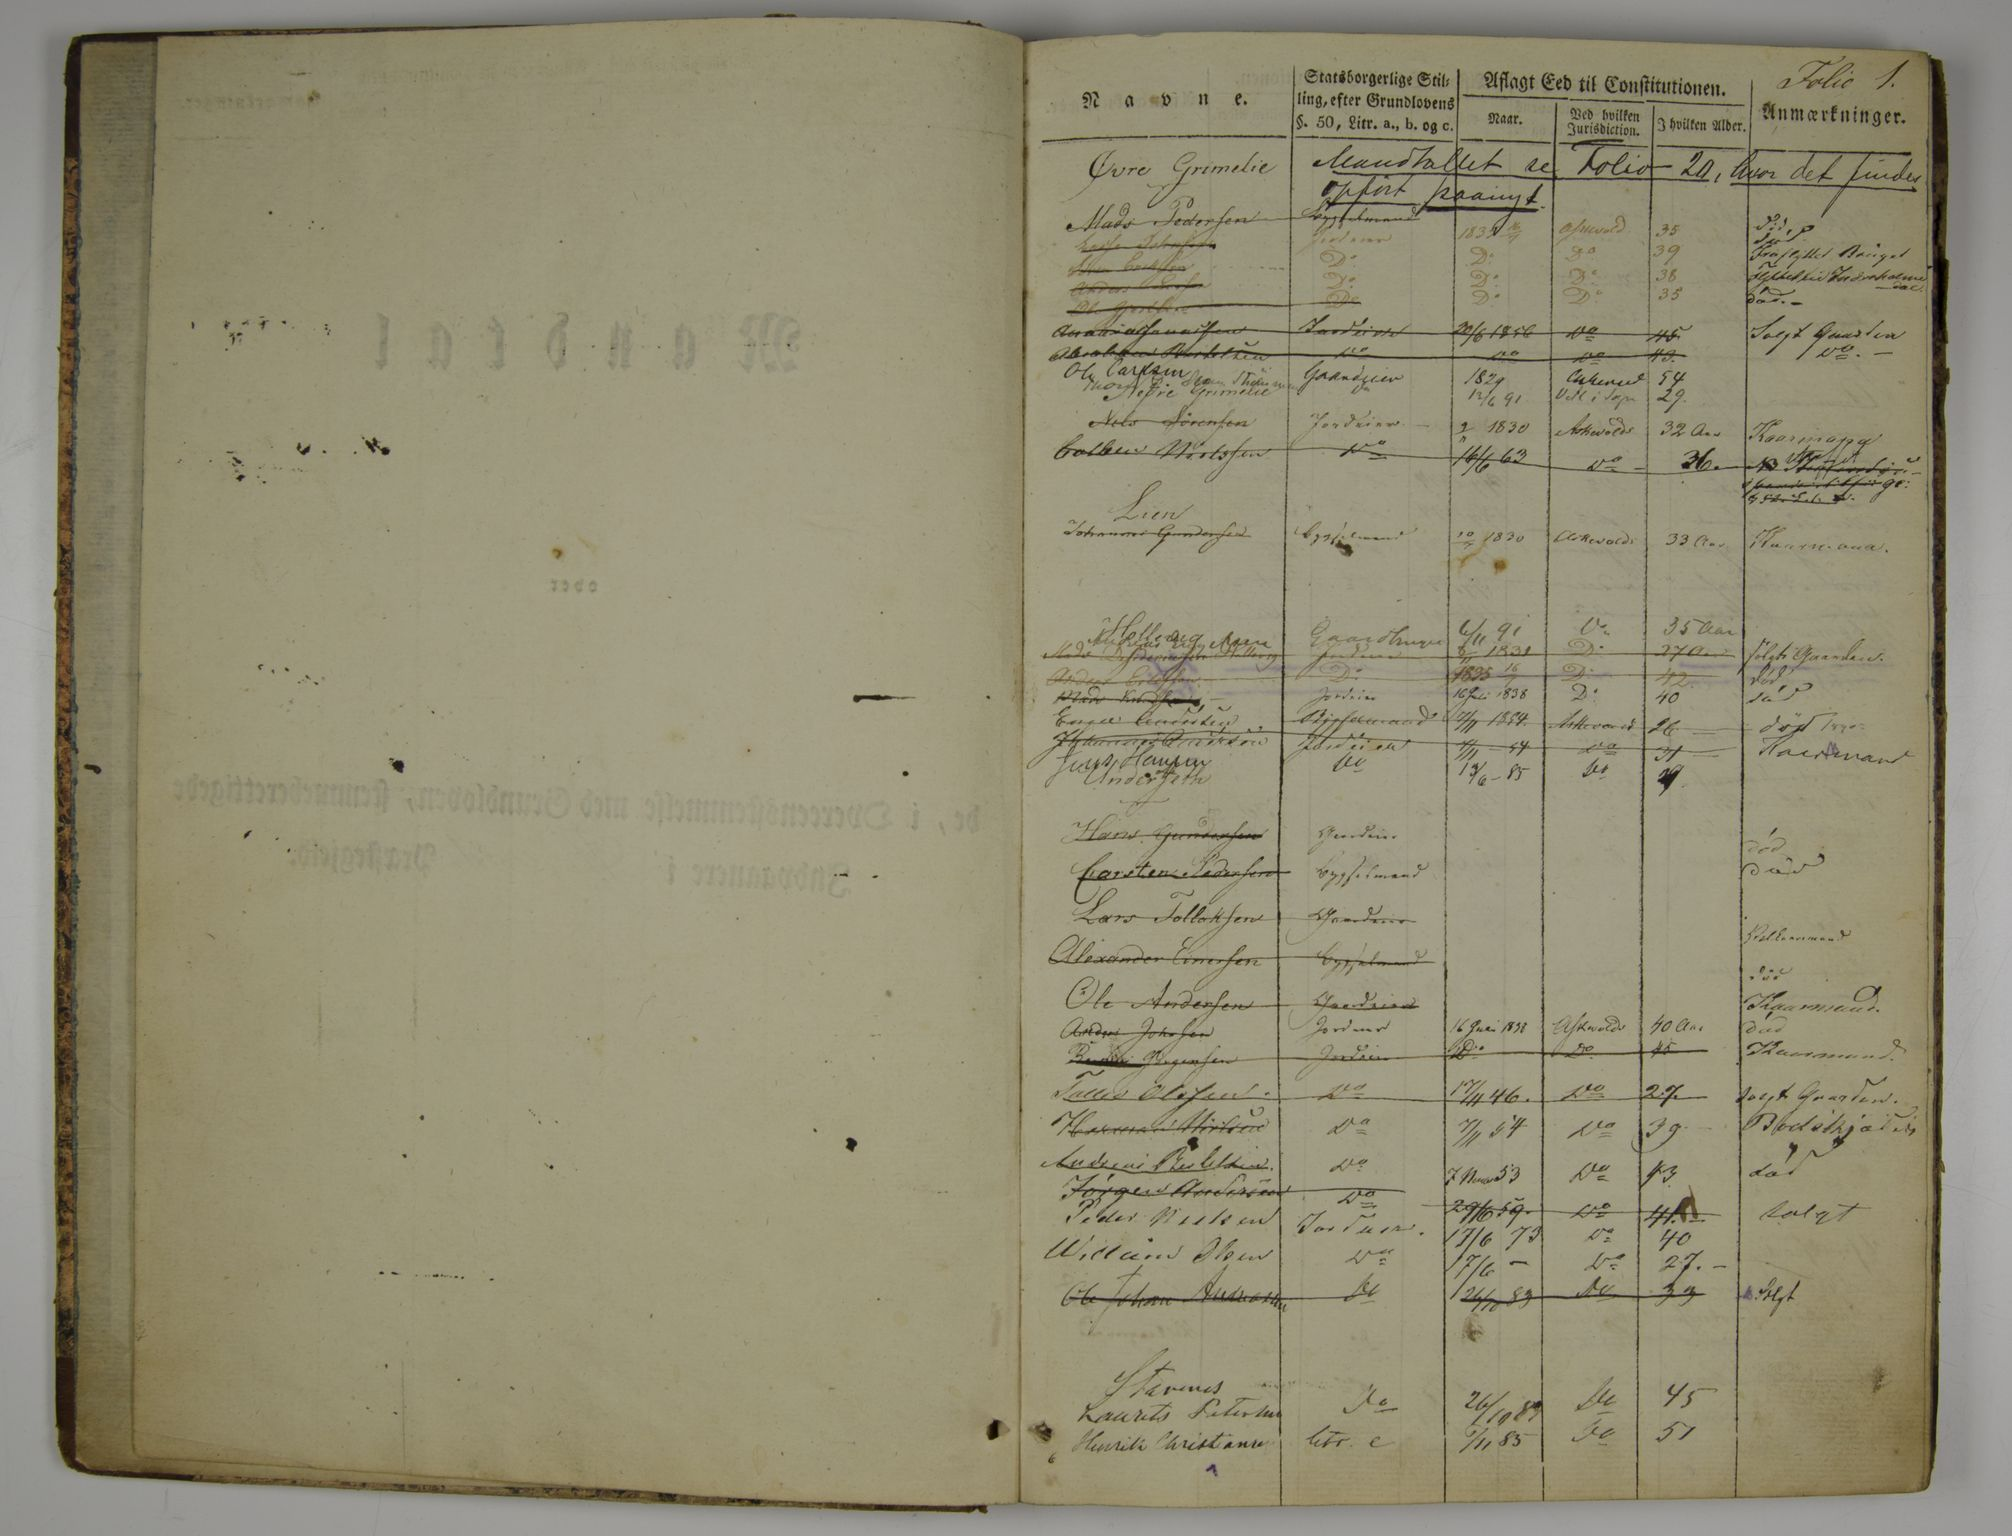 SAB, Lensmannen i Askvoll, 0004/L0001: Manntalsprotokoll, 1829-1897, s. 1a